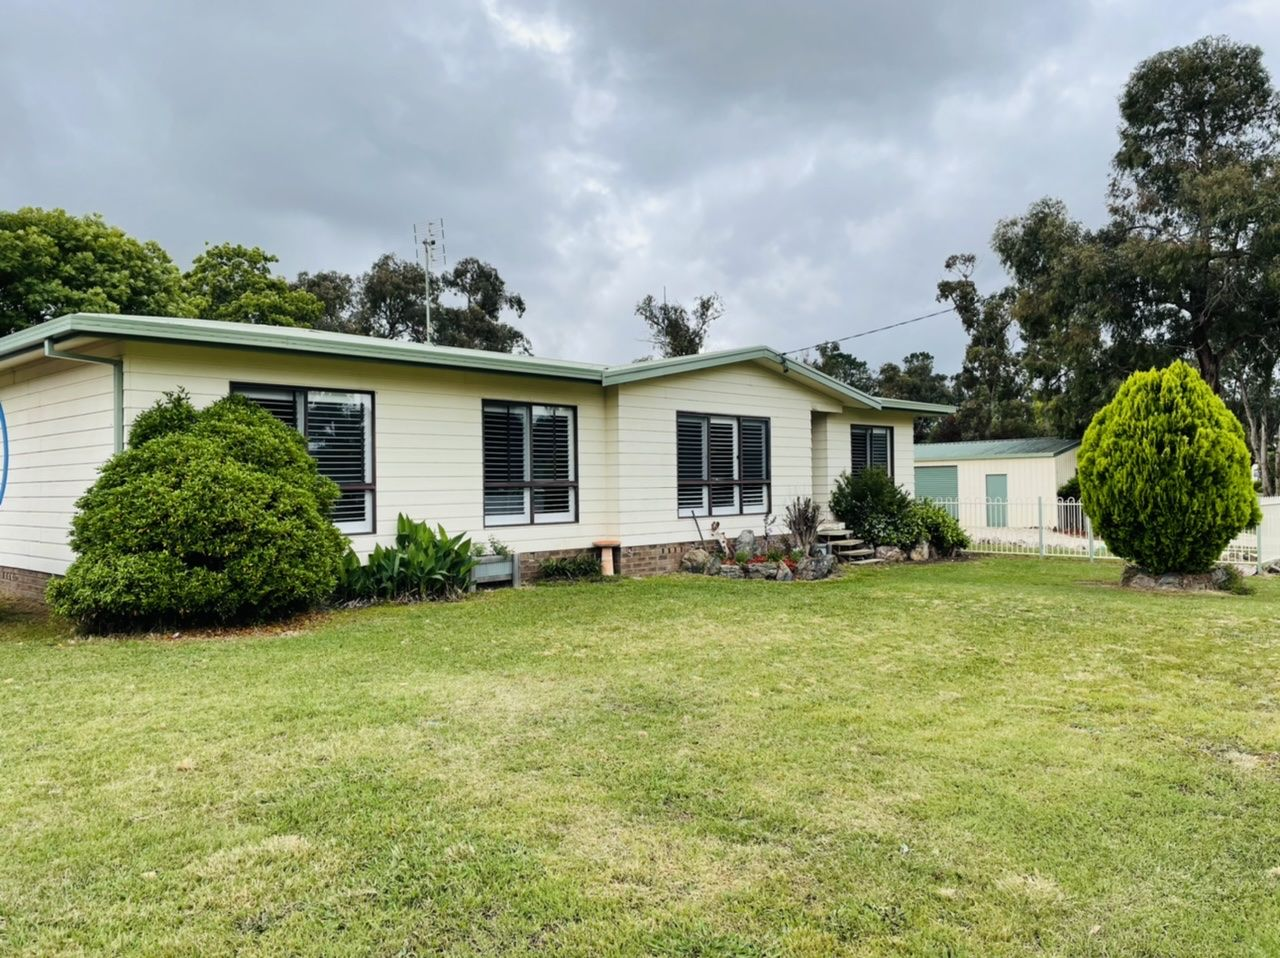 187w North St, Walcha NSW 2354, Image 0